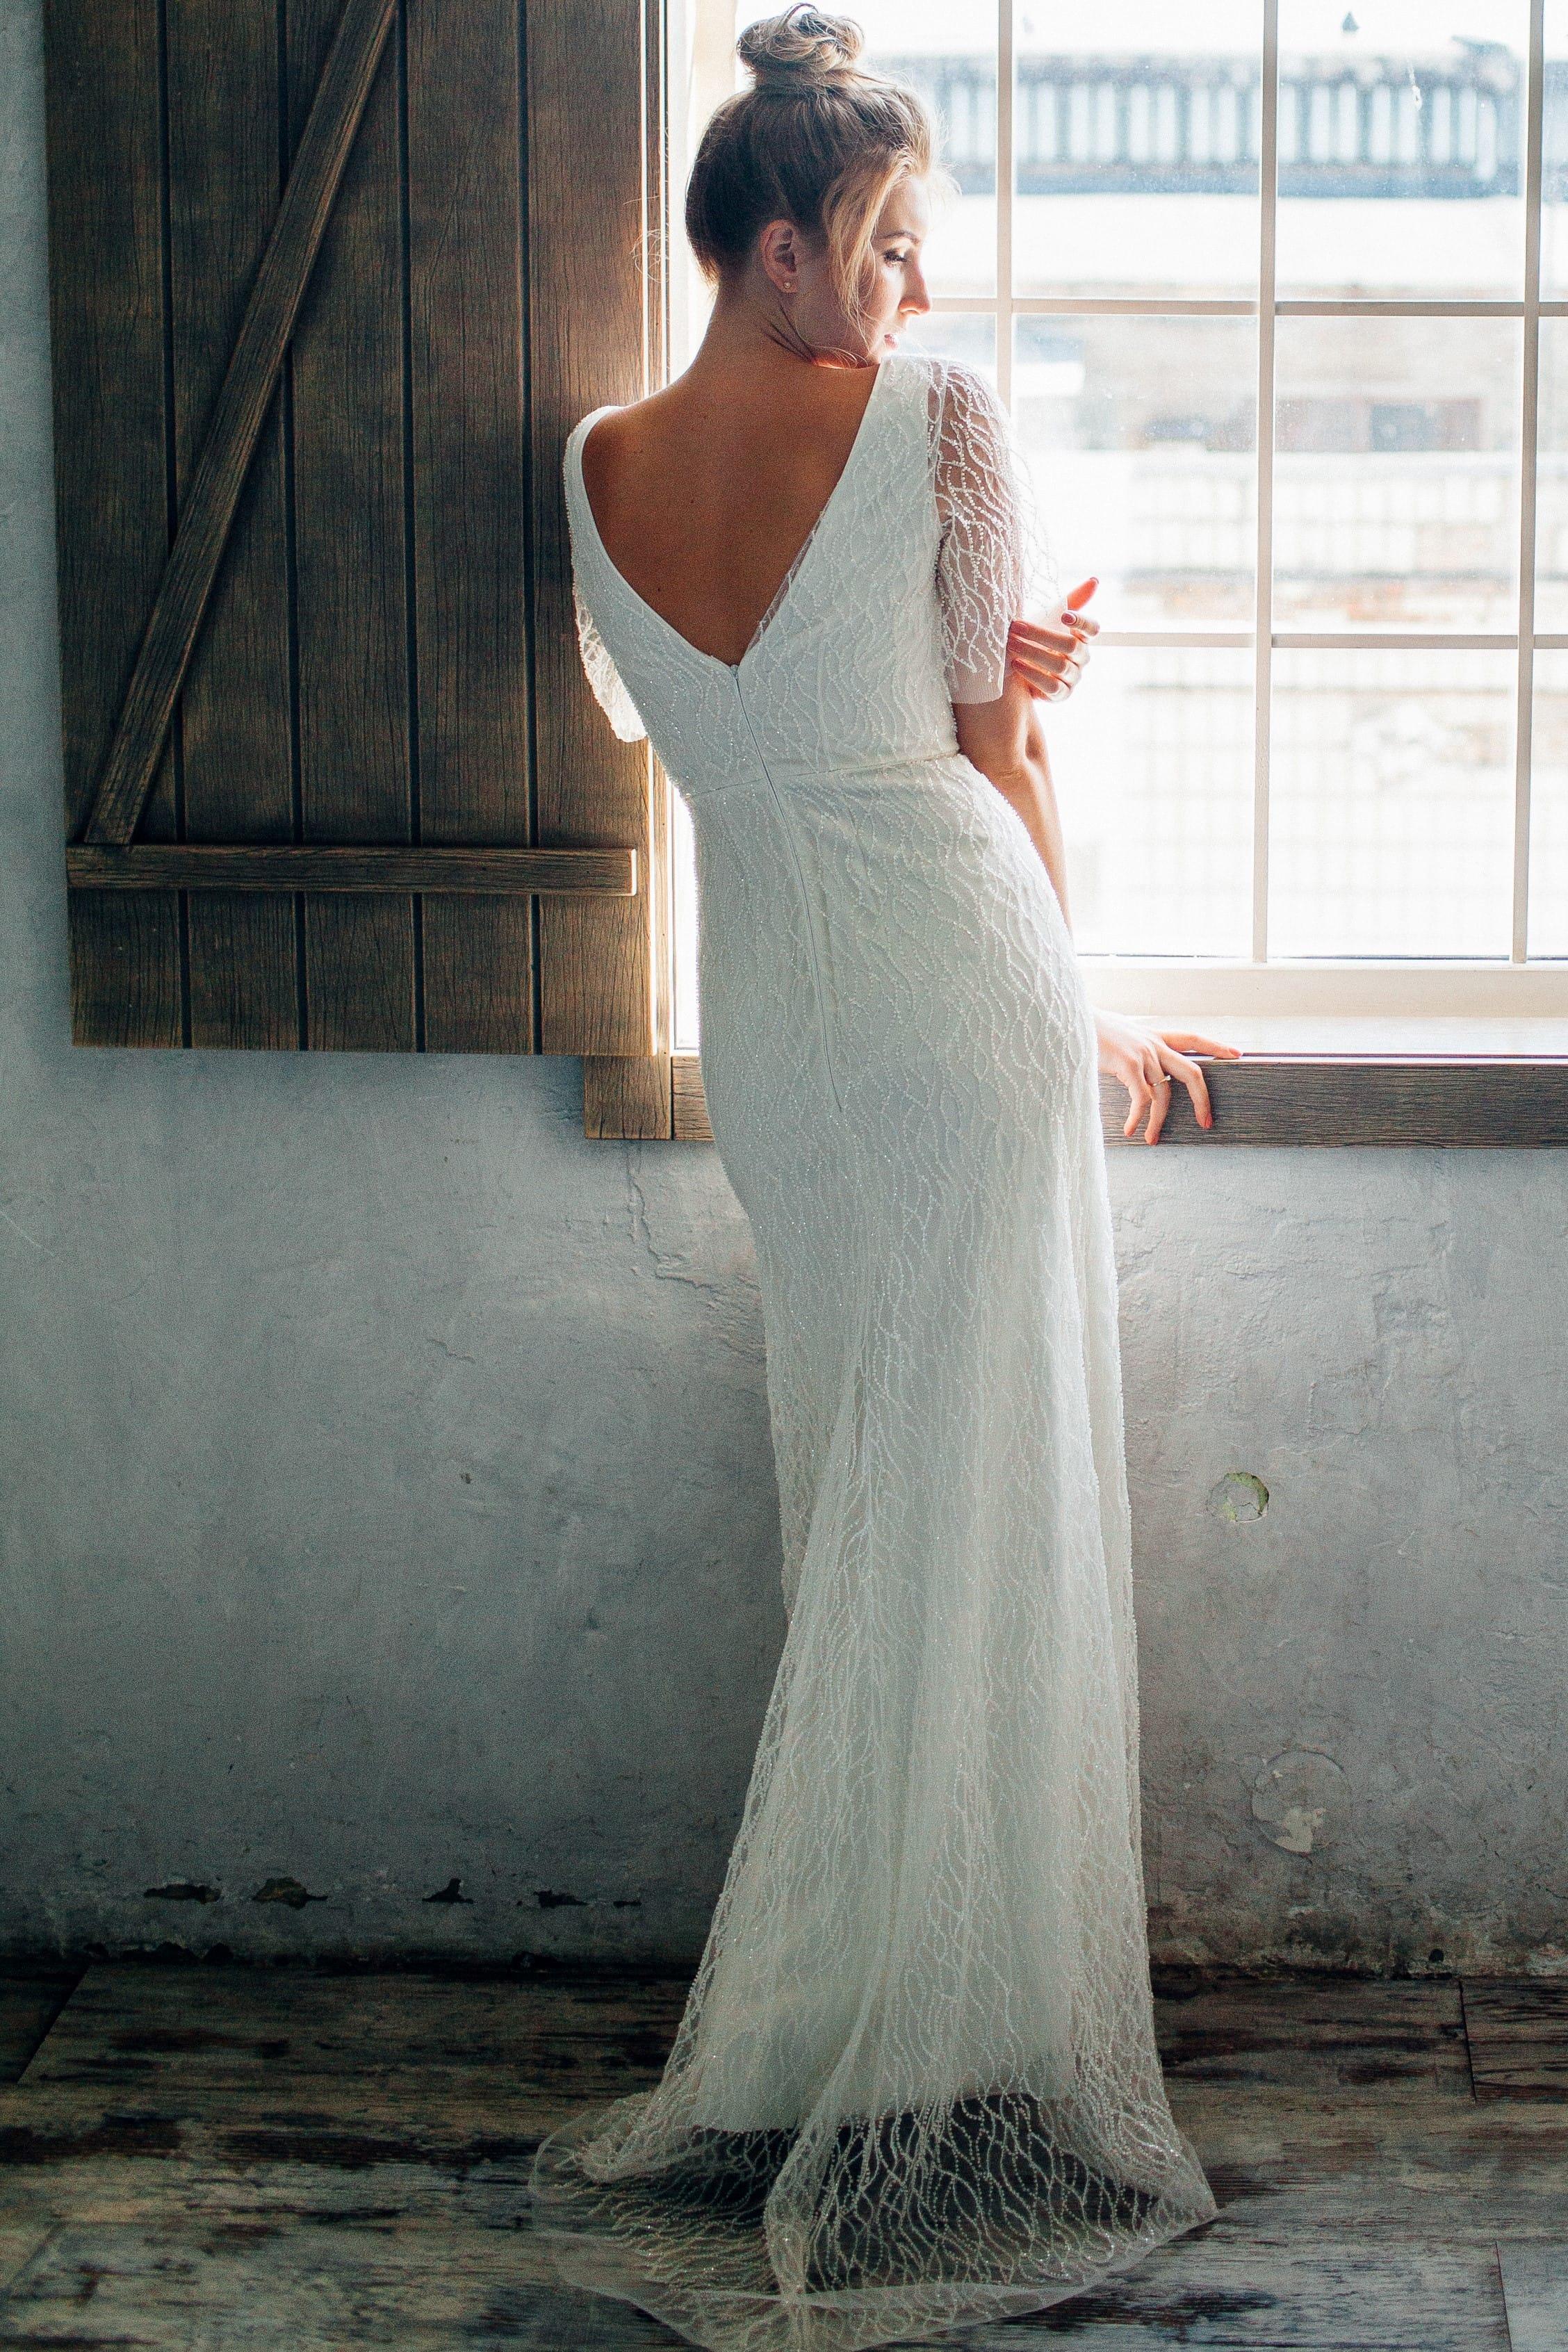 Свадебное платье HADARIELA, коллекция THE ANGELS, бренд RARE BRIDAL, фото 2